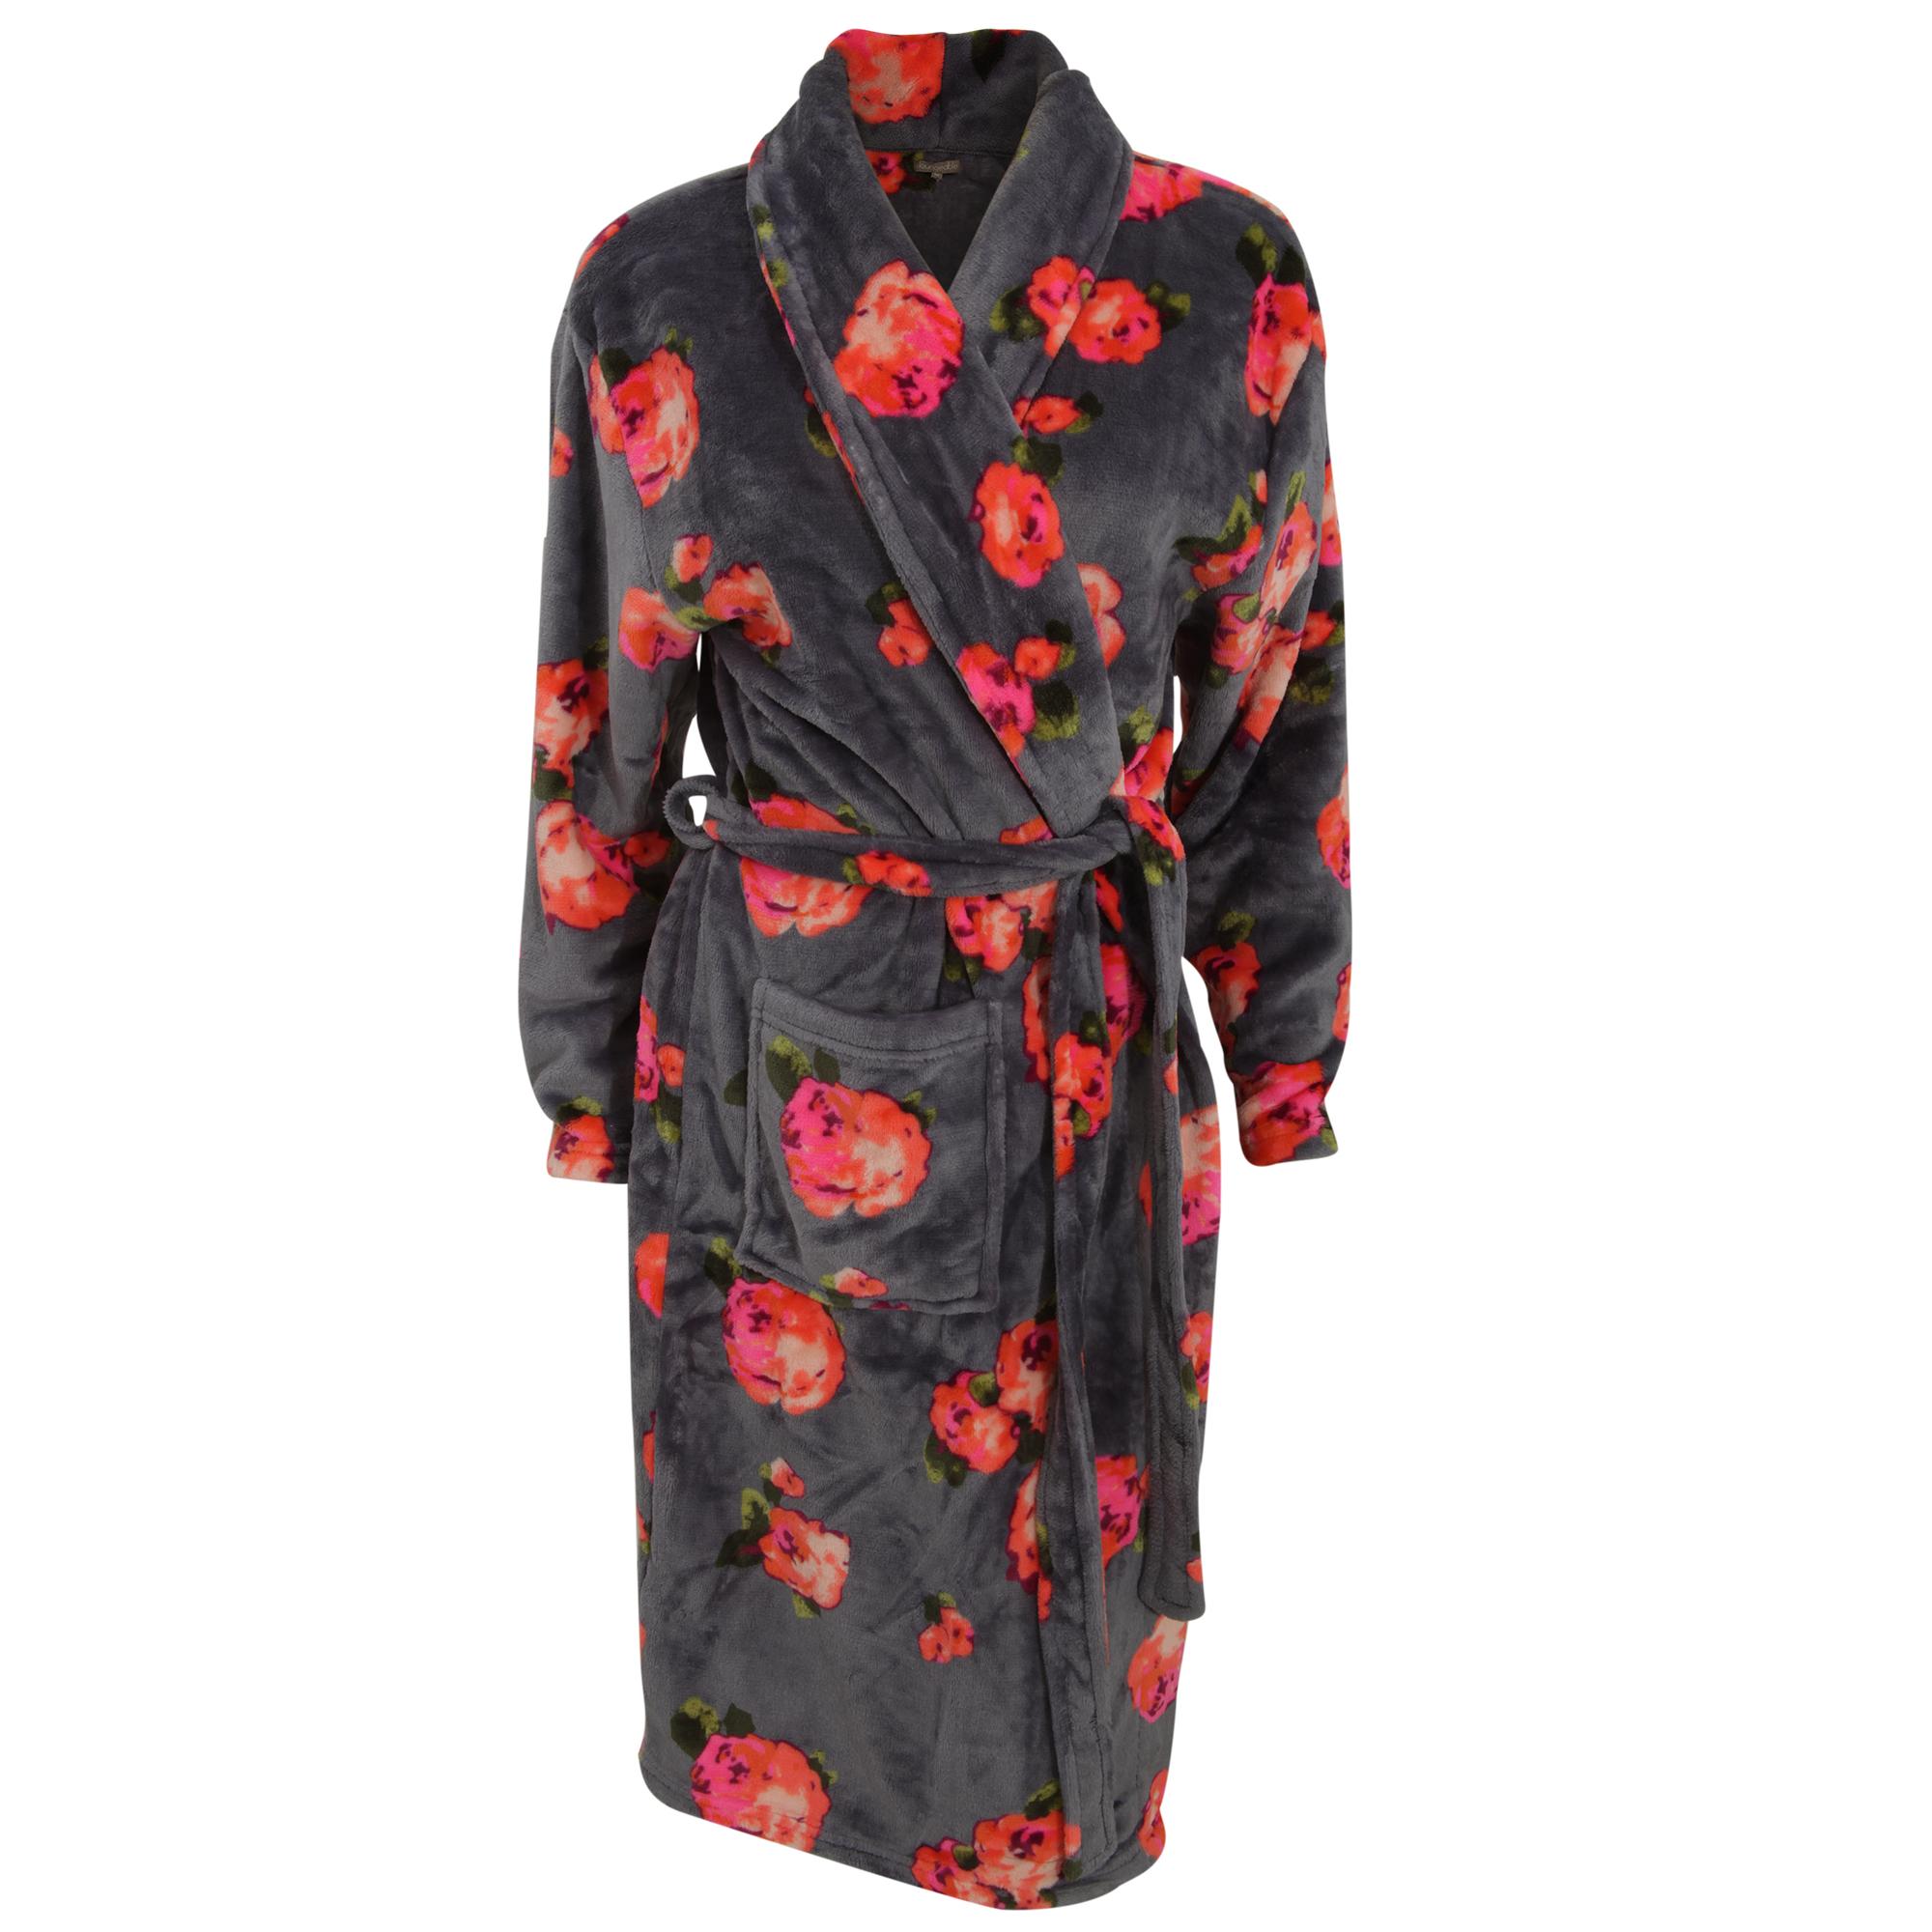 damen fleece bademantel mit rosenmuster ebay. Black Bedroom Furniture Sets. Home Design Ideas